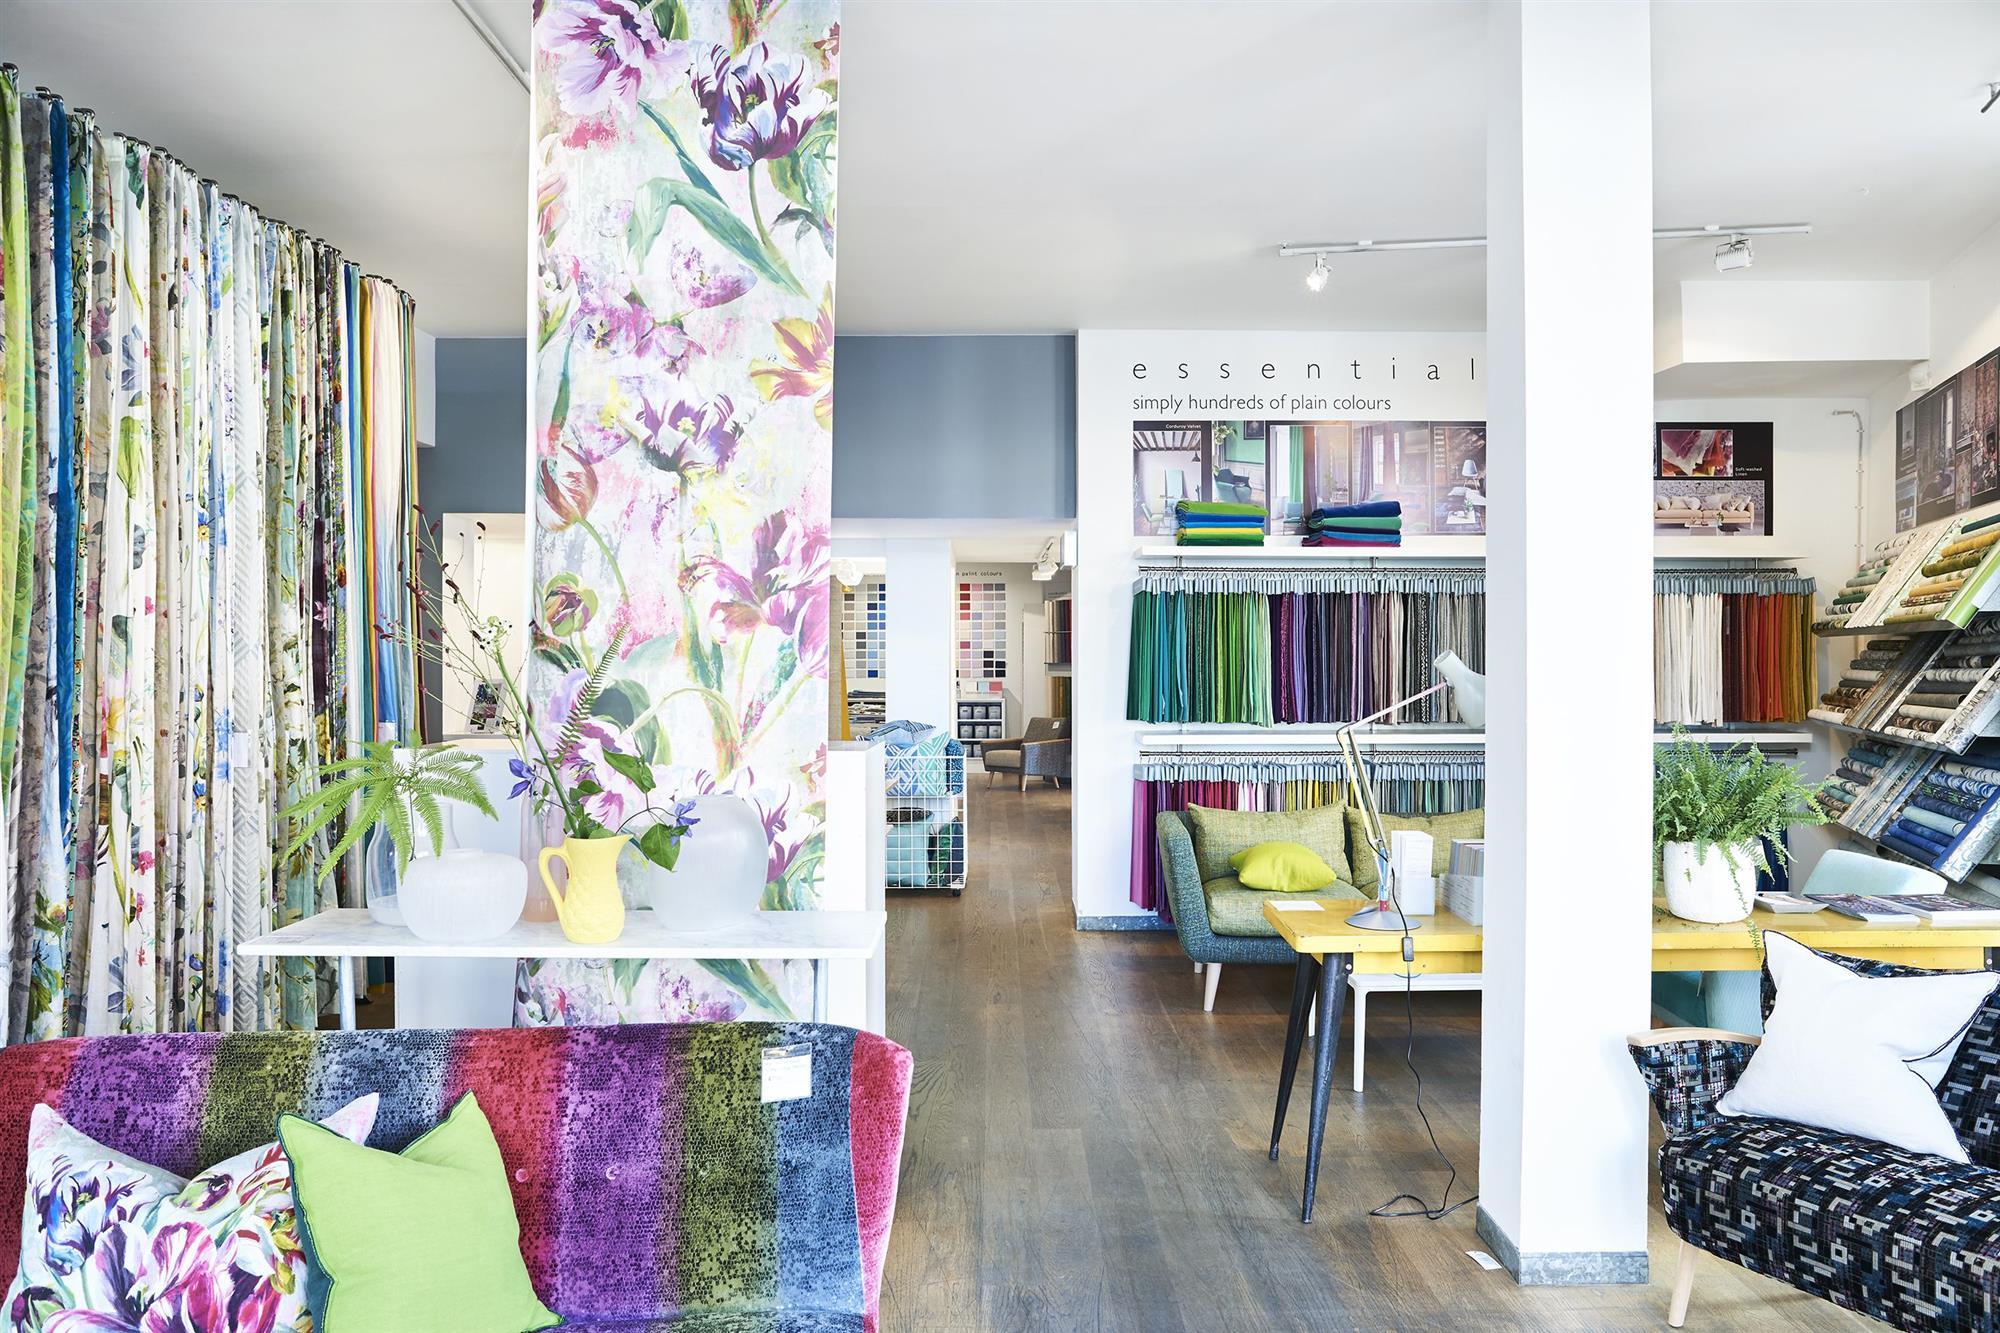 Tiendas de decoraci n de londres - Designers guild telas ...